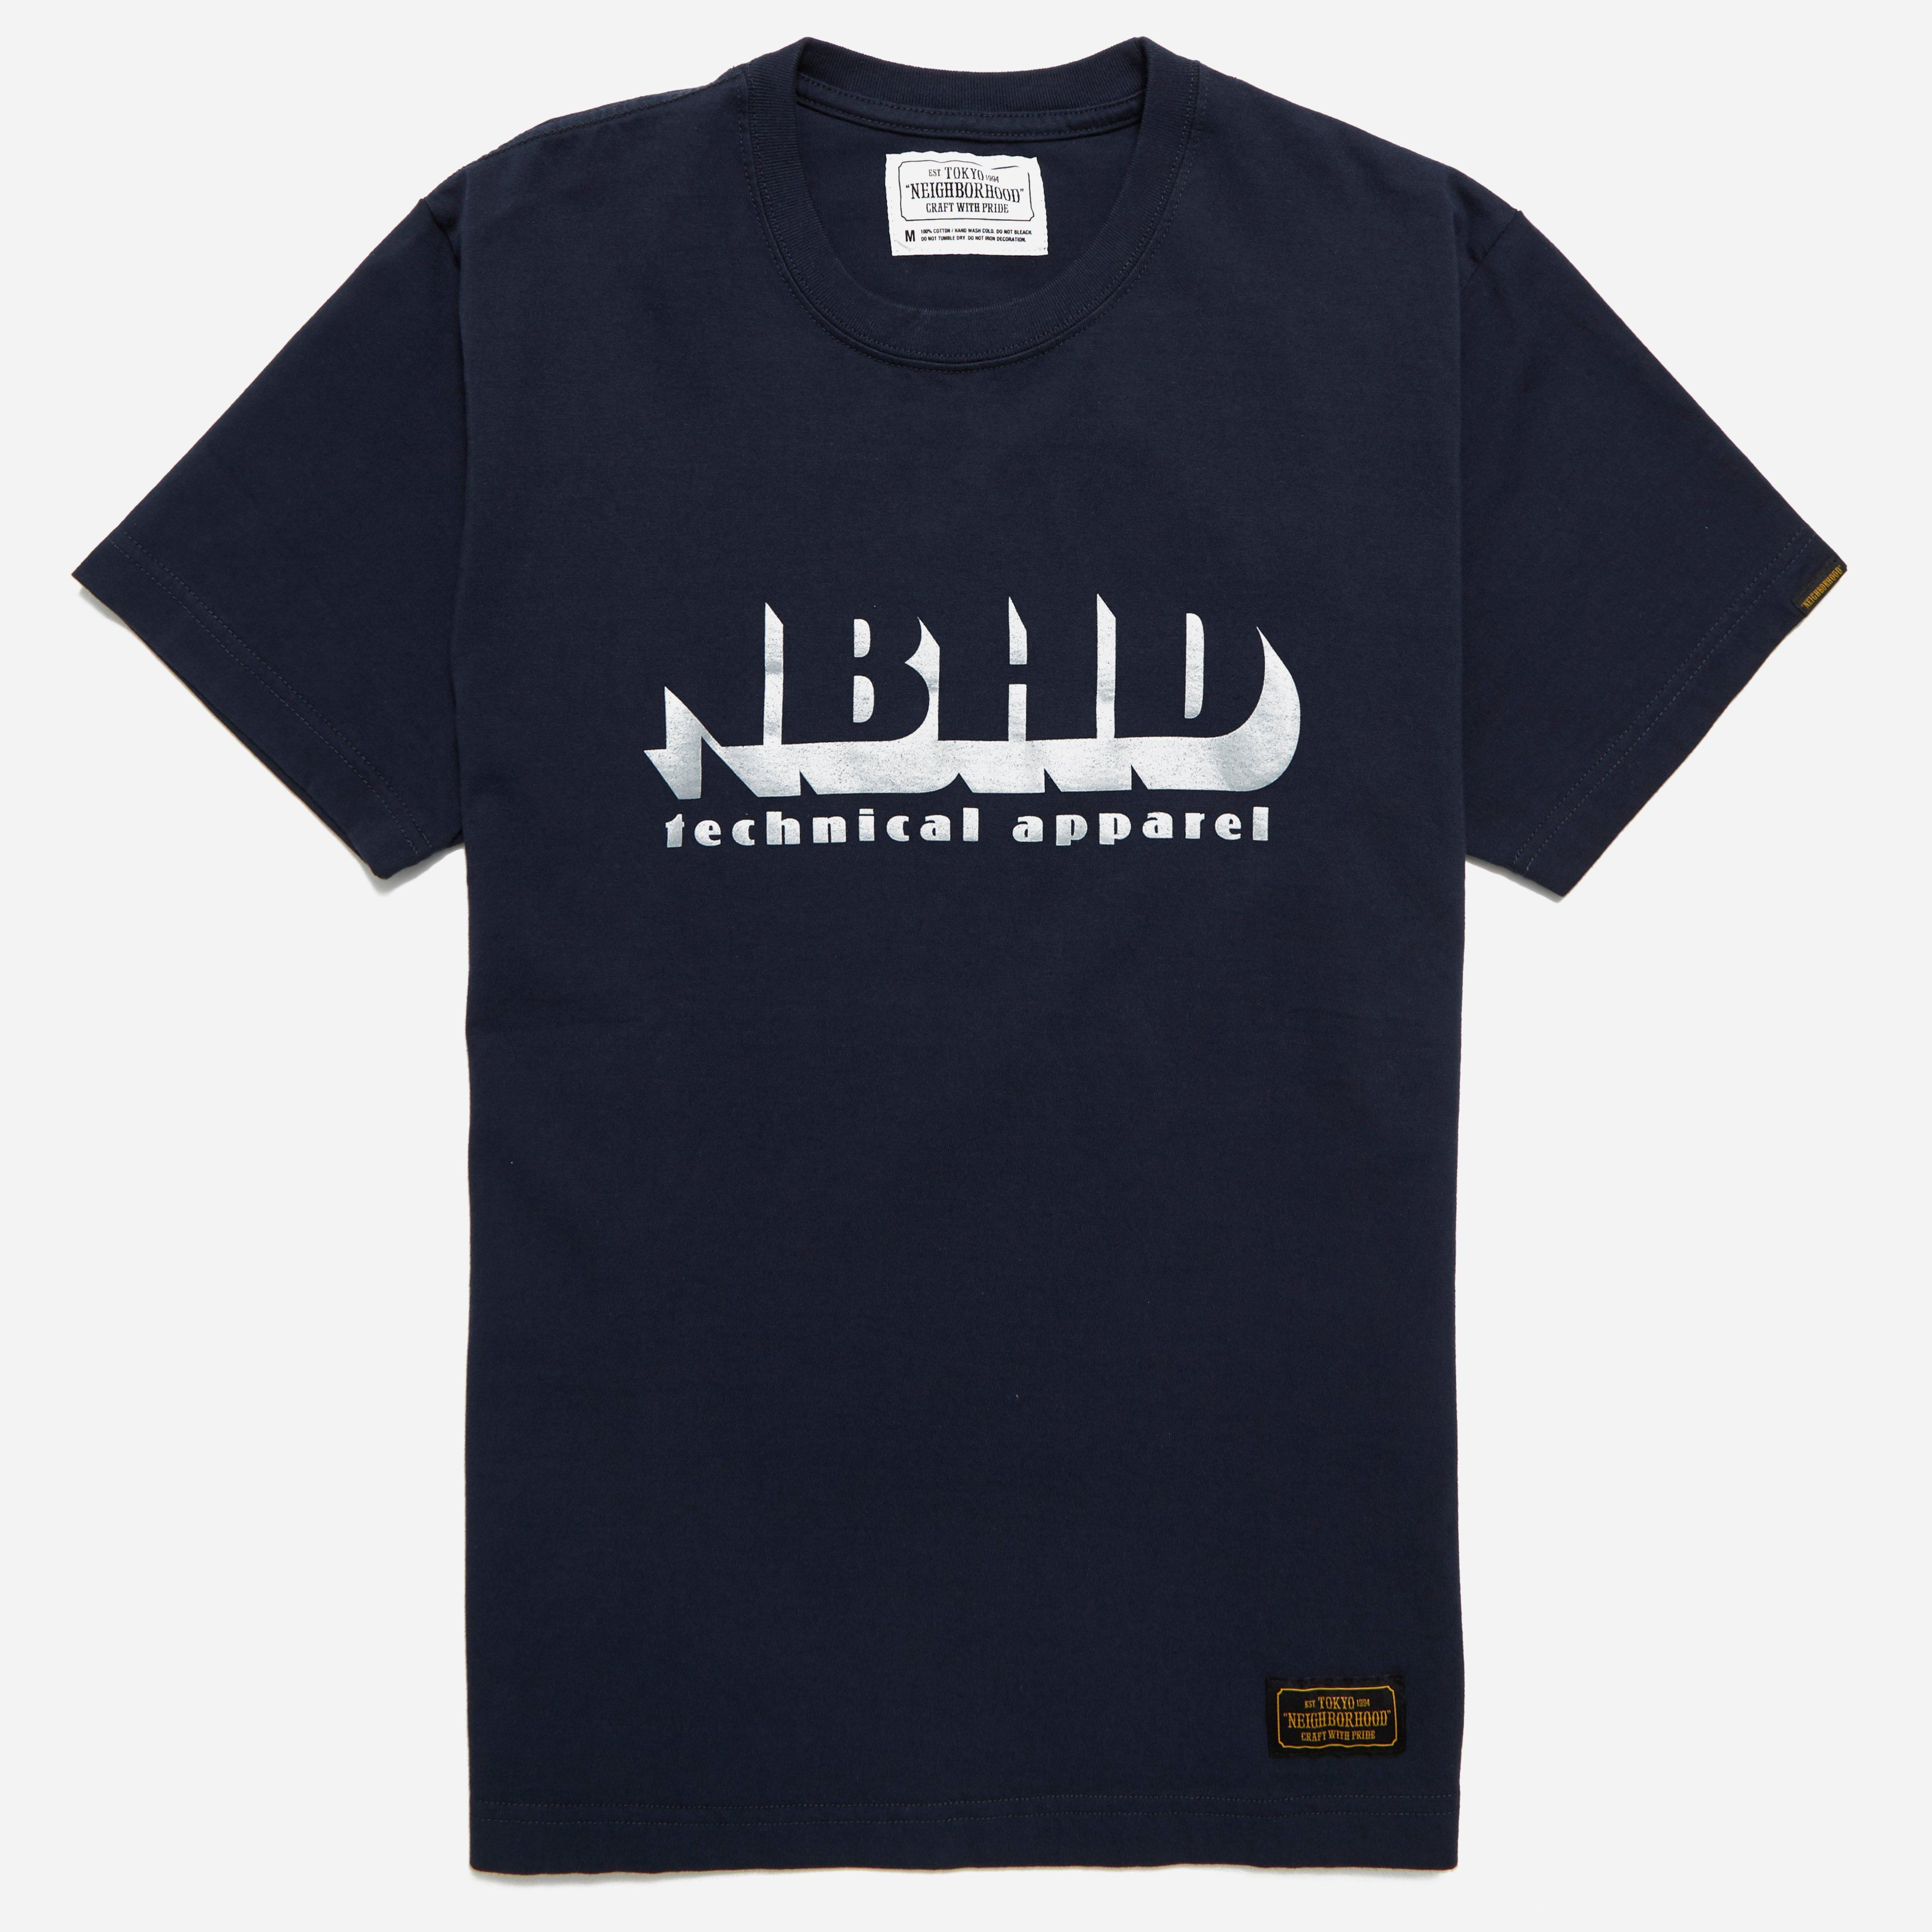 Neighborhood Shade T-shirt